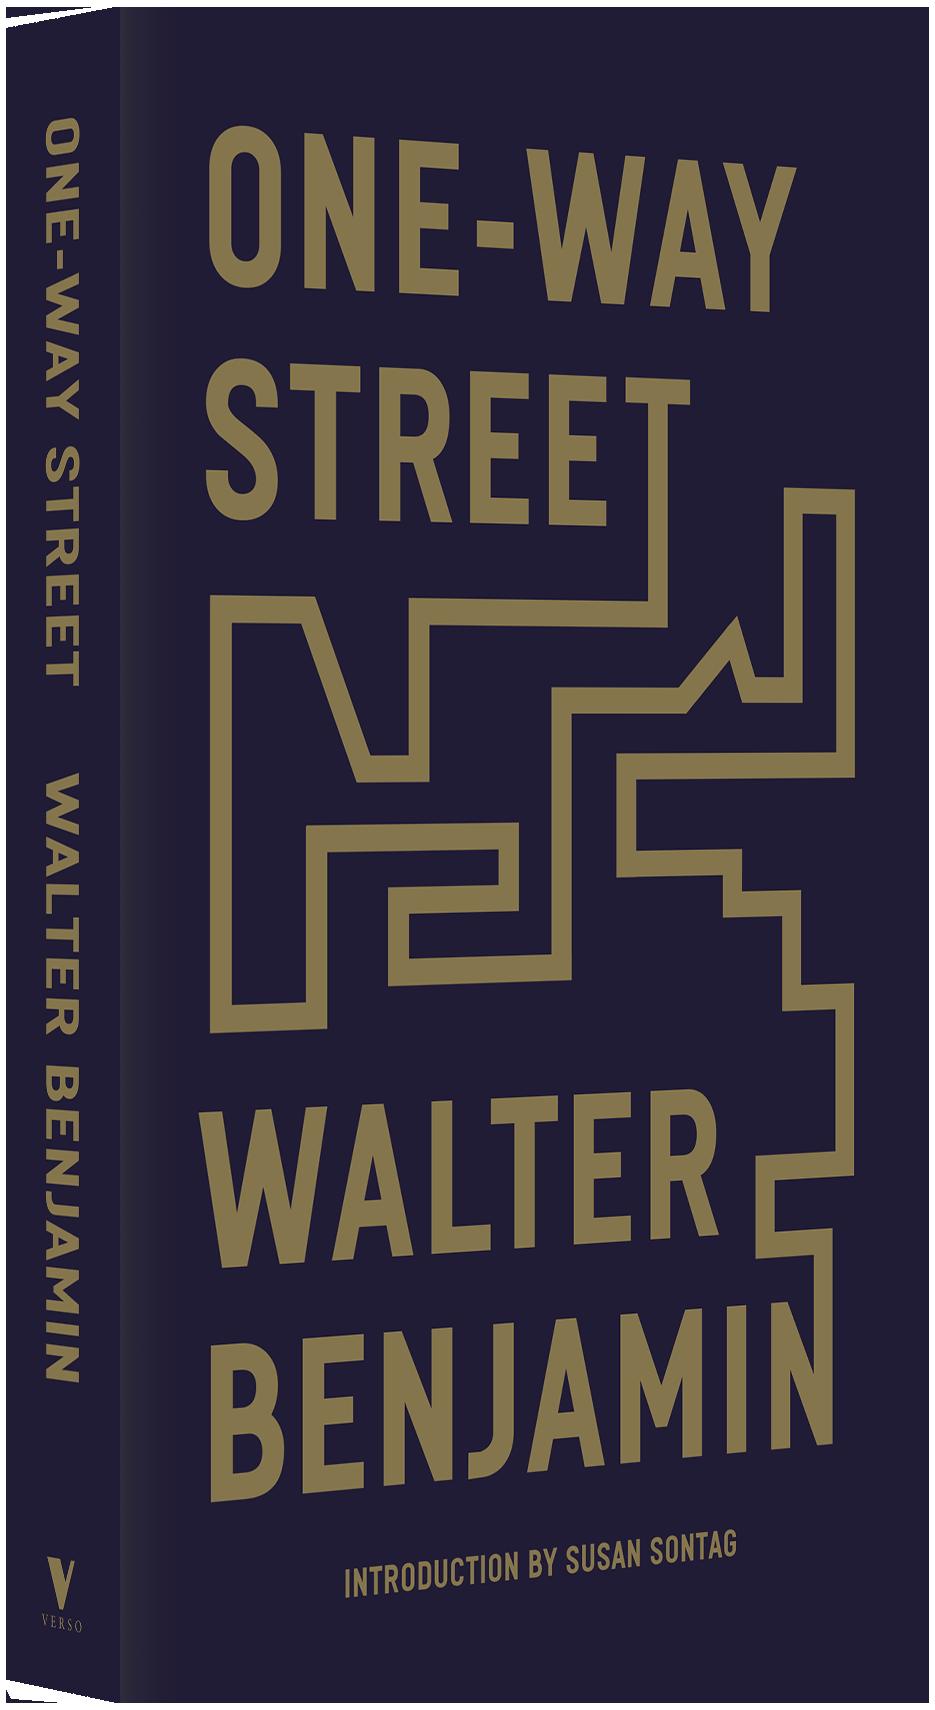 One-street-way_%281%29